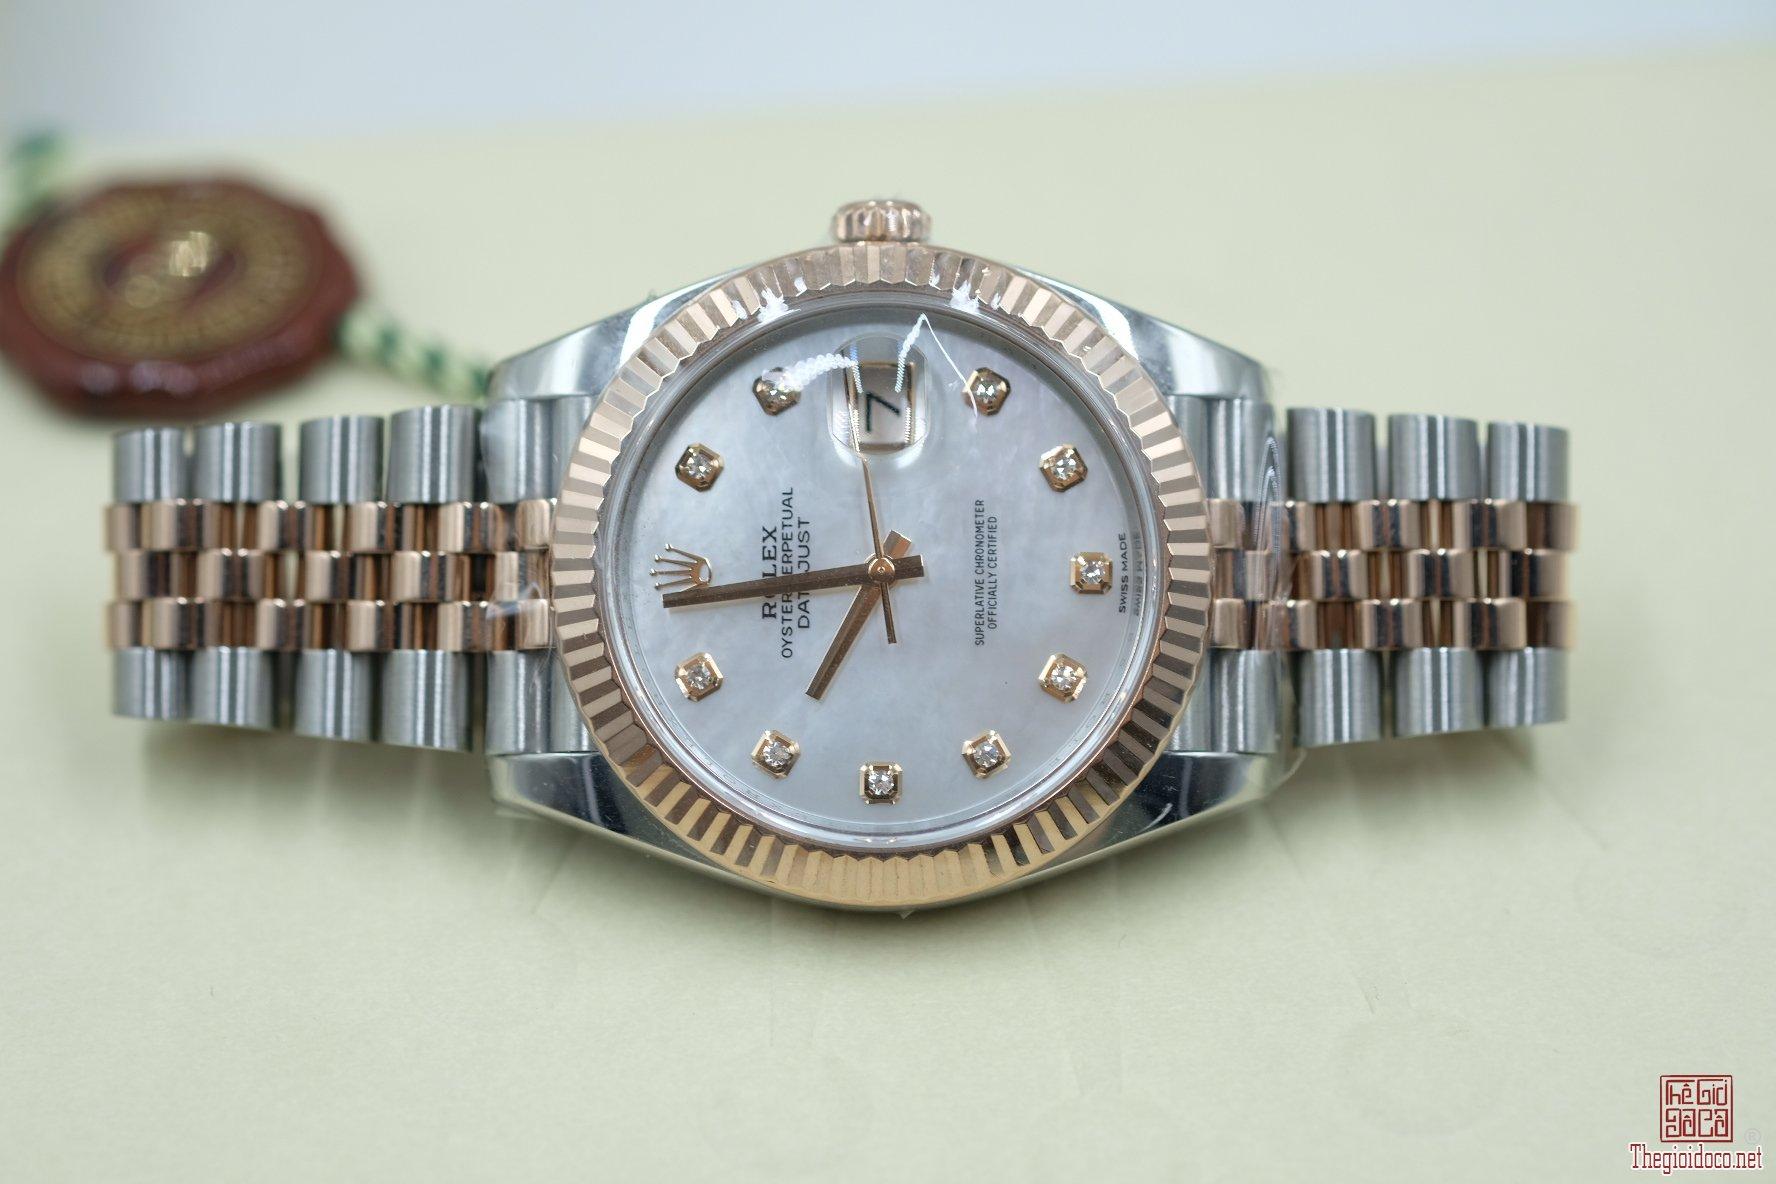 Đồng hồ Rolex Date-just 126331 Demi vàng hồng 18k